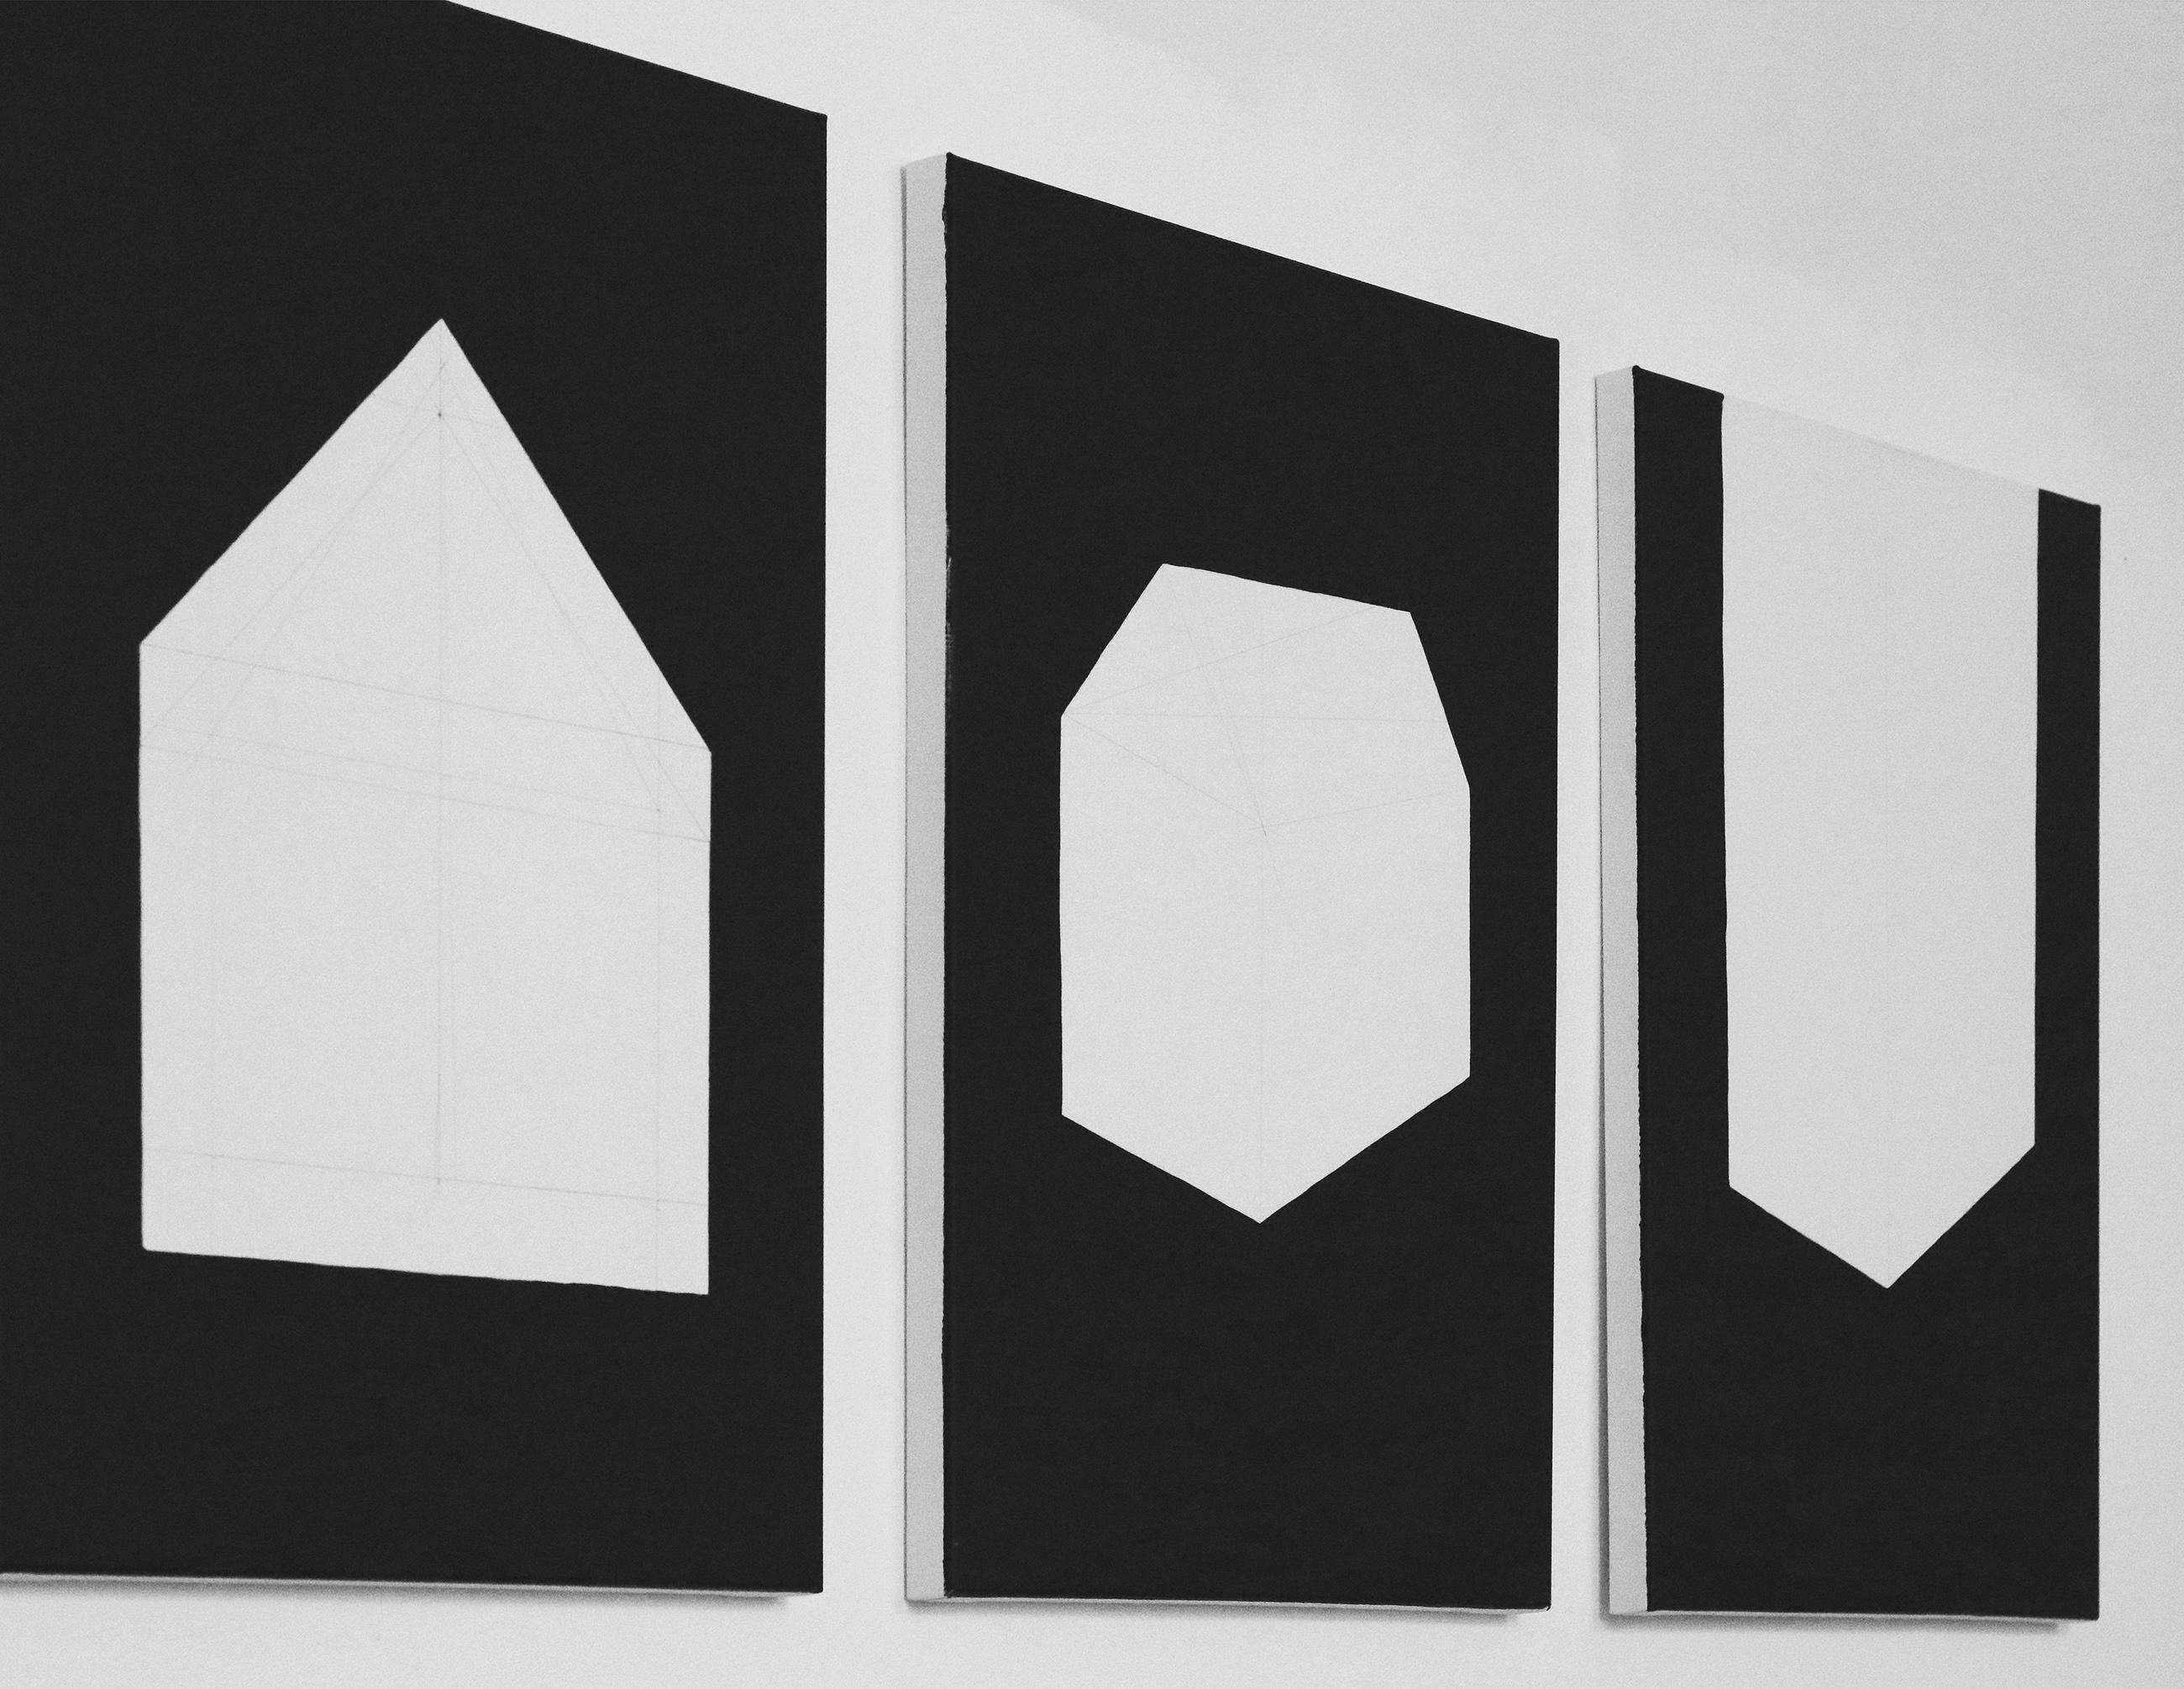 Jürgen Bauer, House (Deconstruction), 2018, Acryl auf Leinwand, je 100 × 70 cm